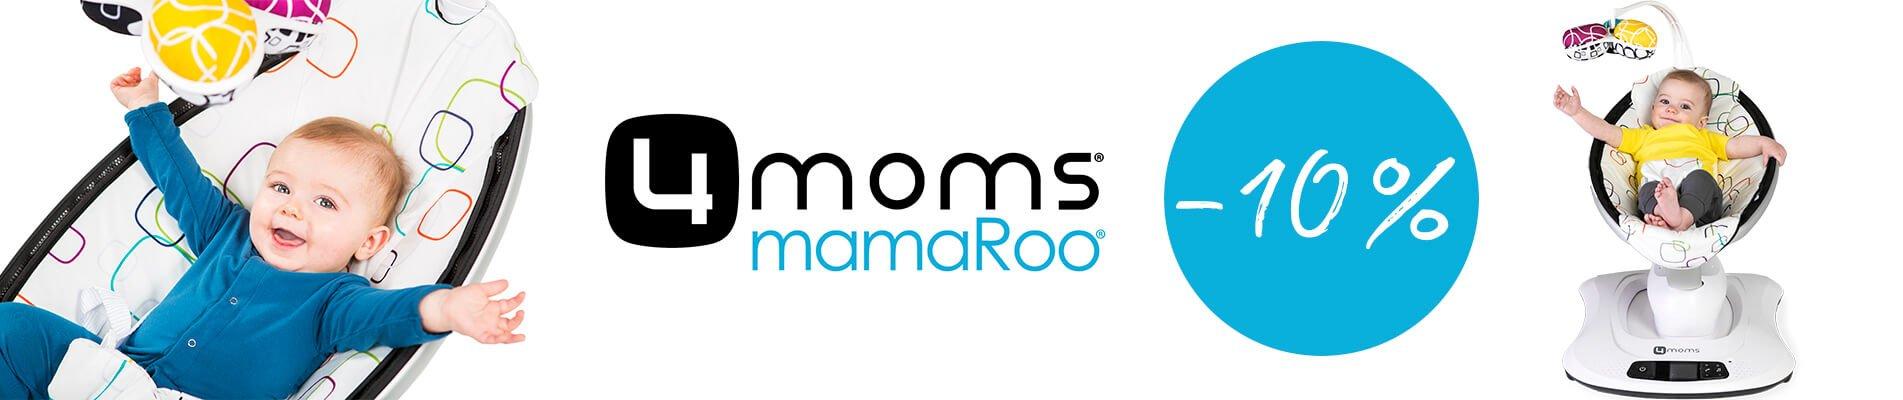 4MOMS-mamaRoo-1903X400